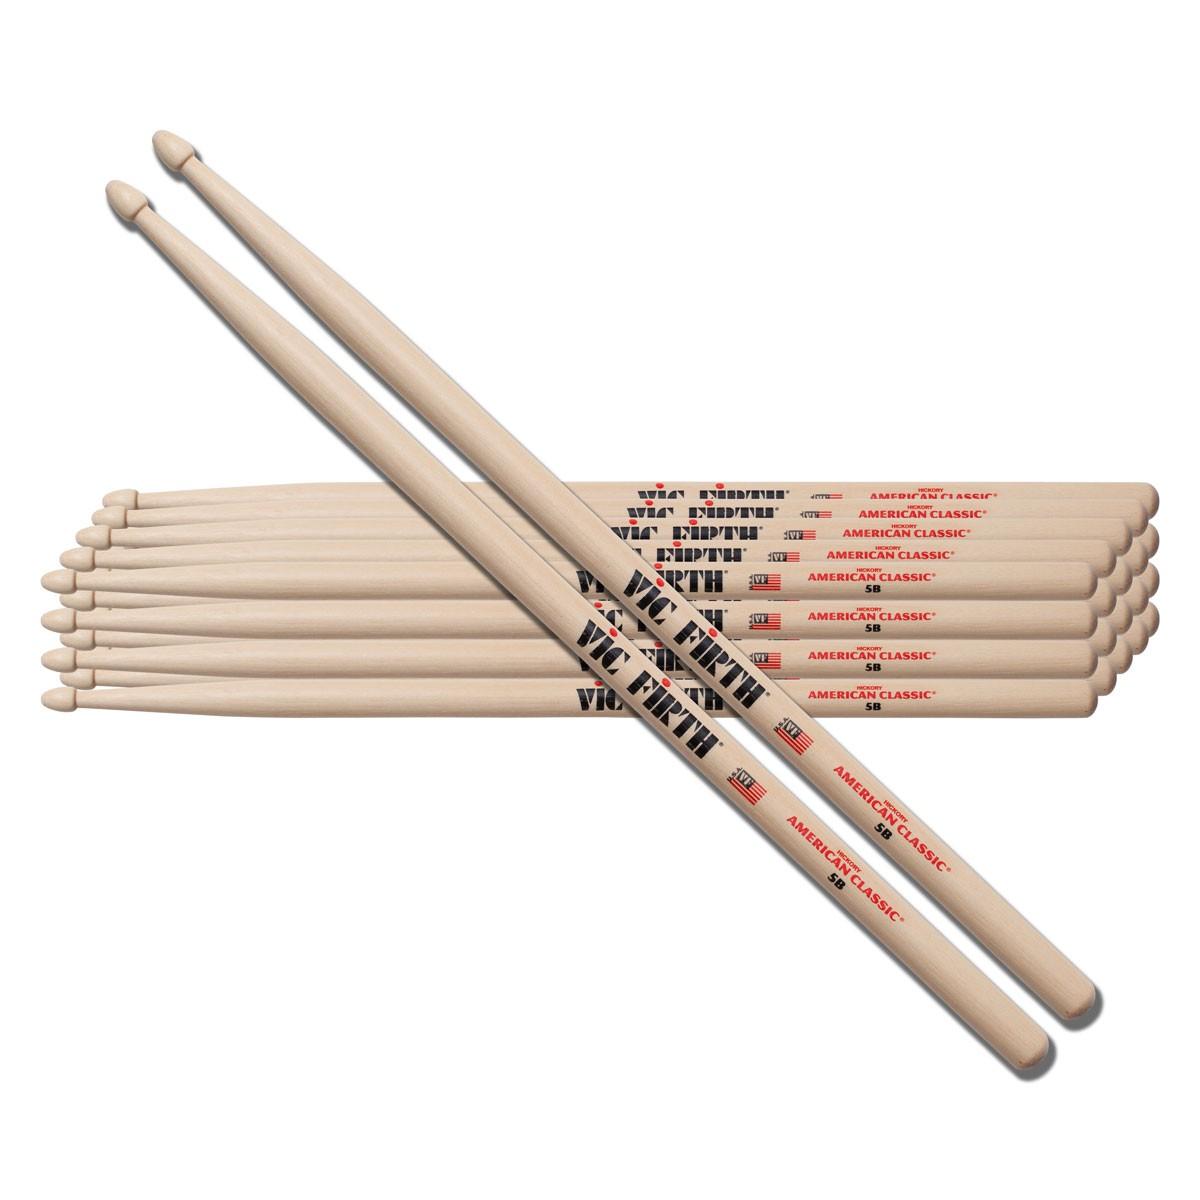 Vic-Firth 5B Sticks American Classic Wood Tip